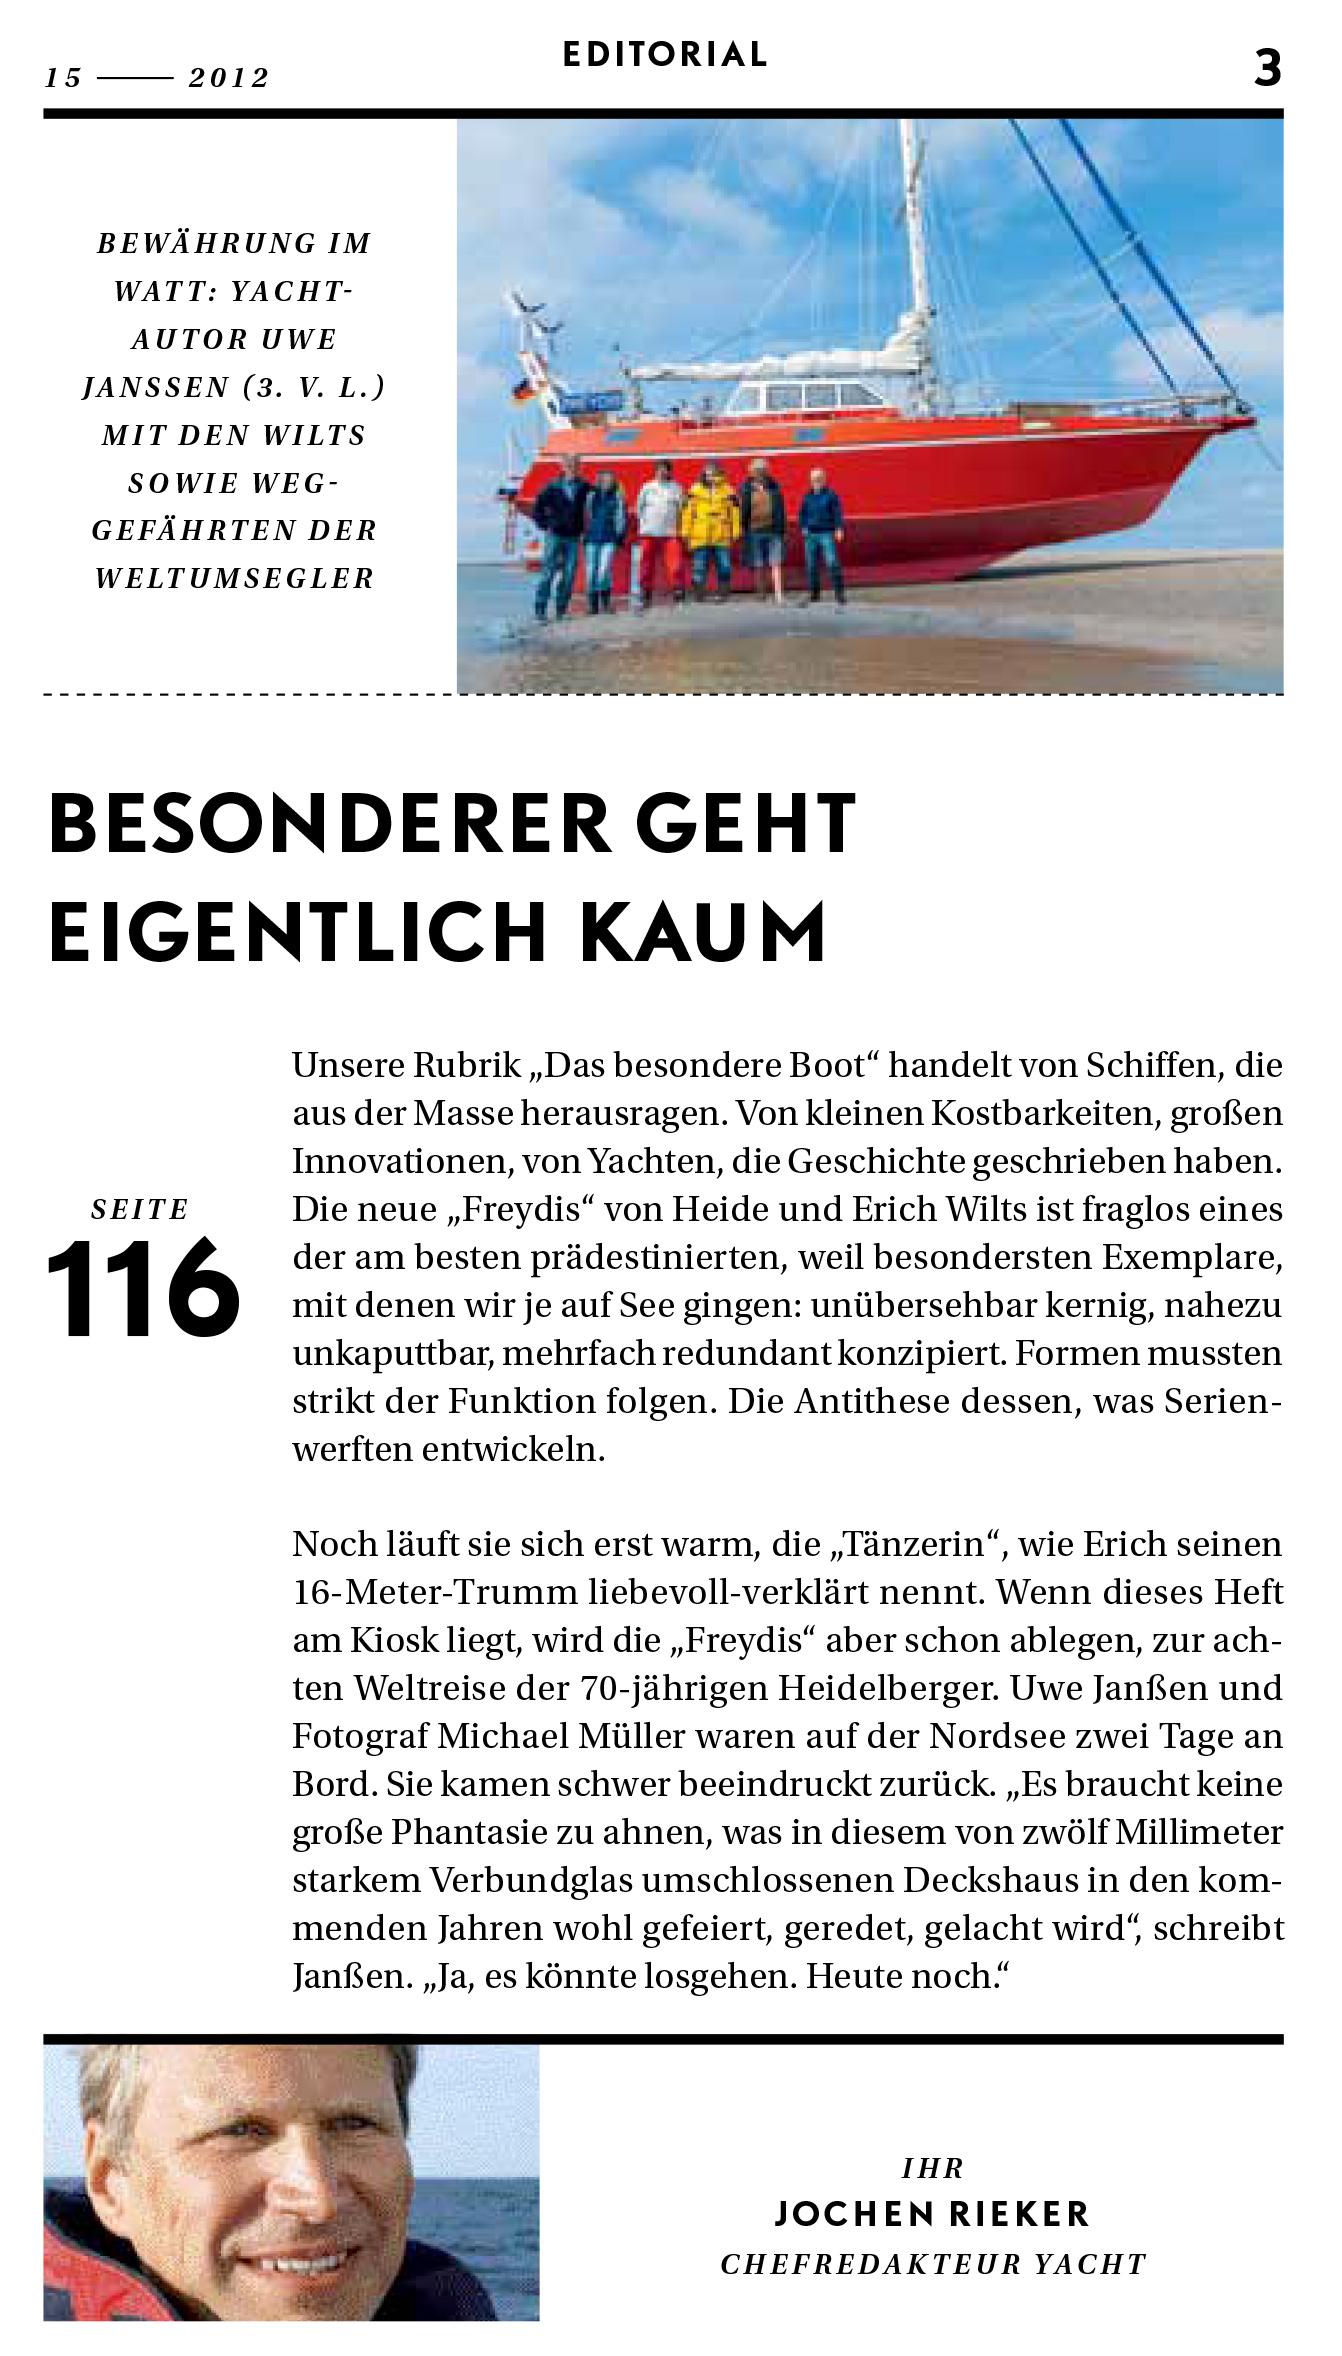 Editorial (YACHT 15/12)